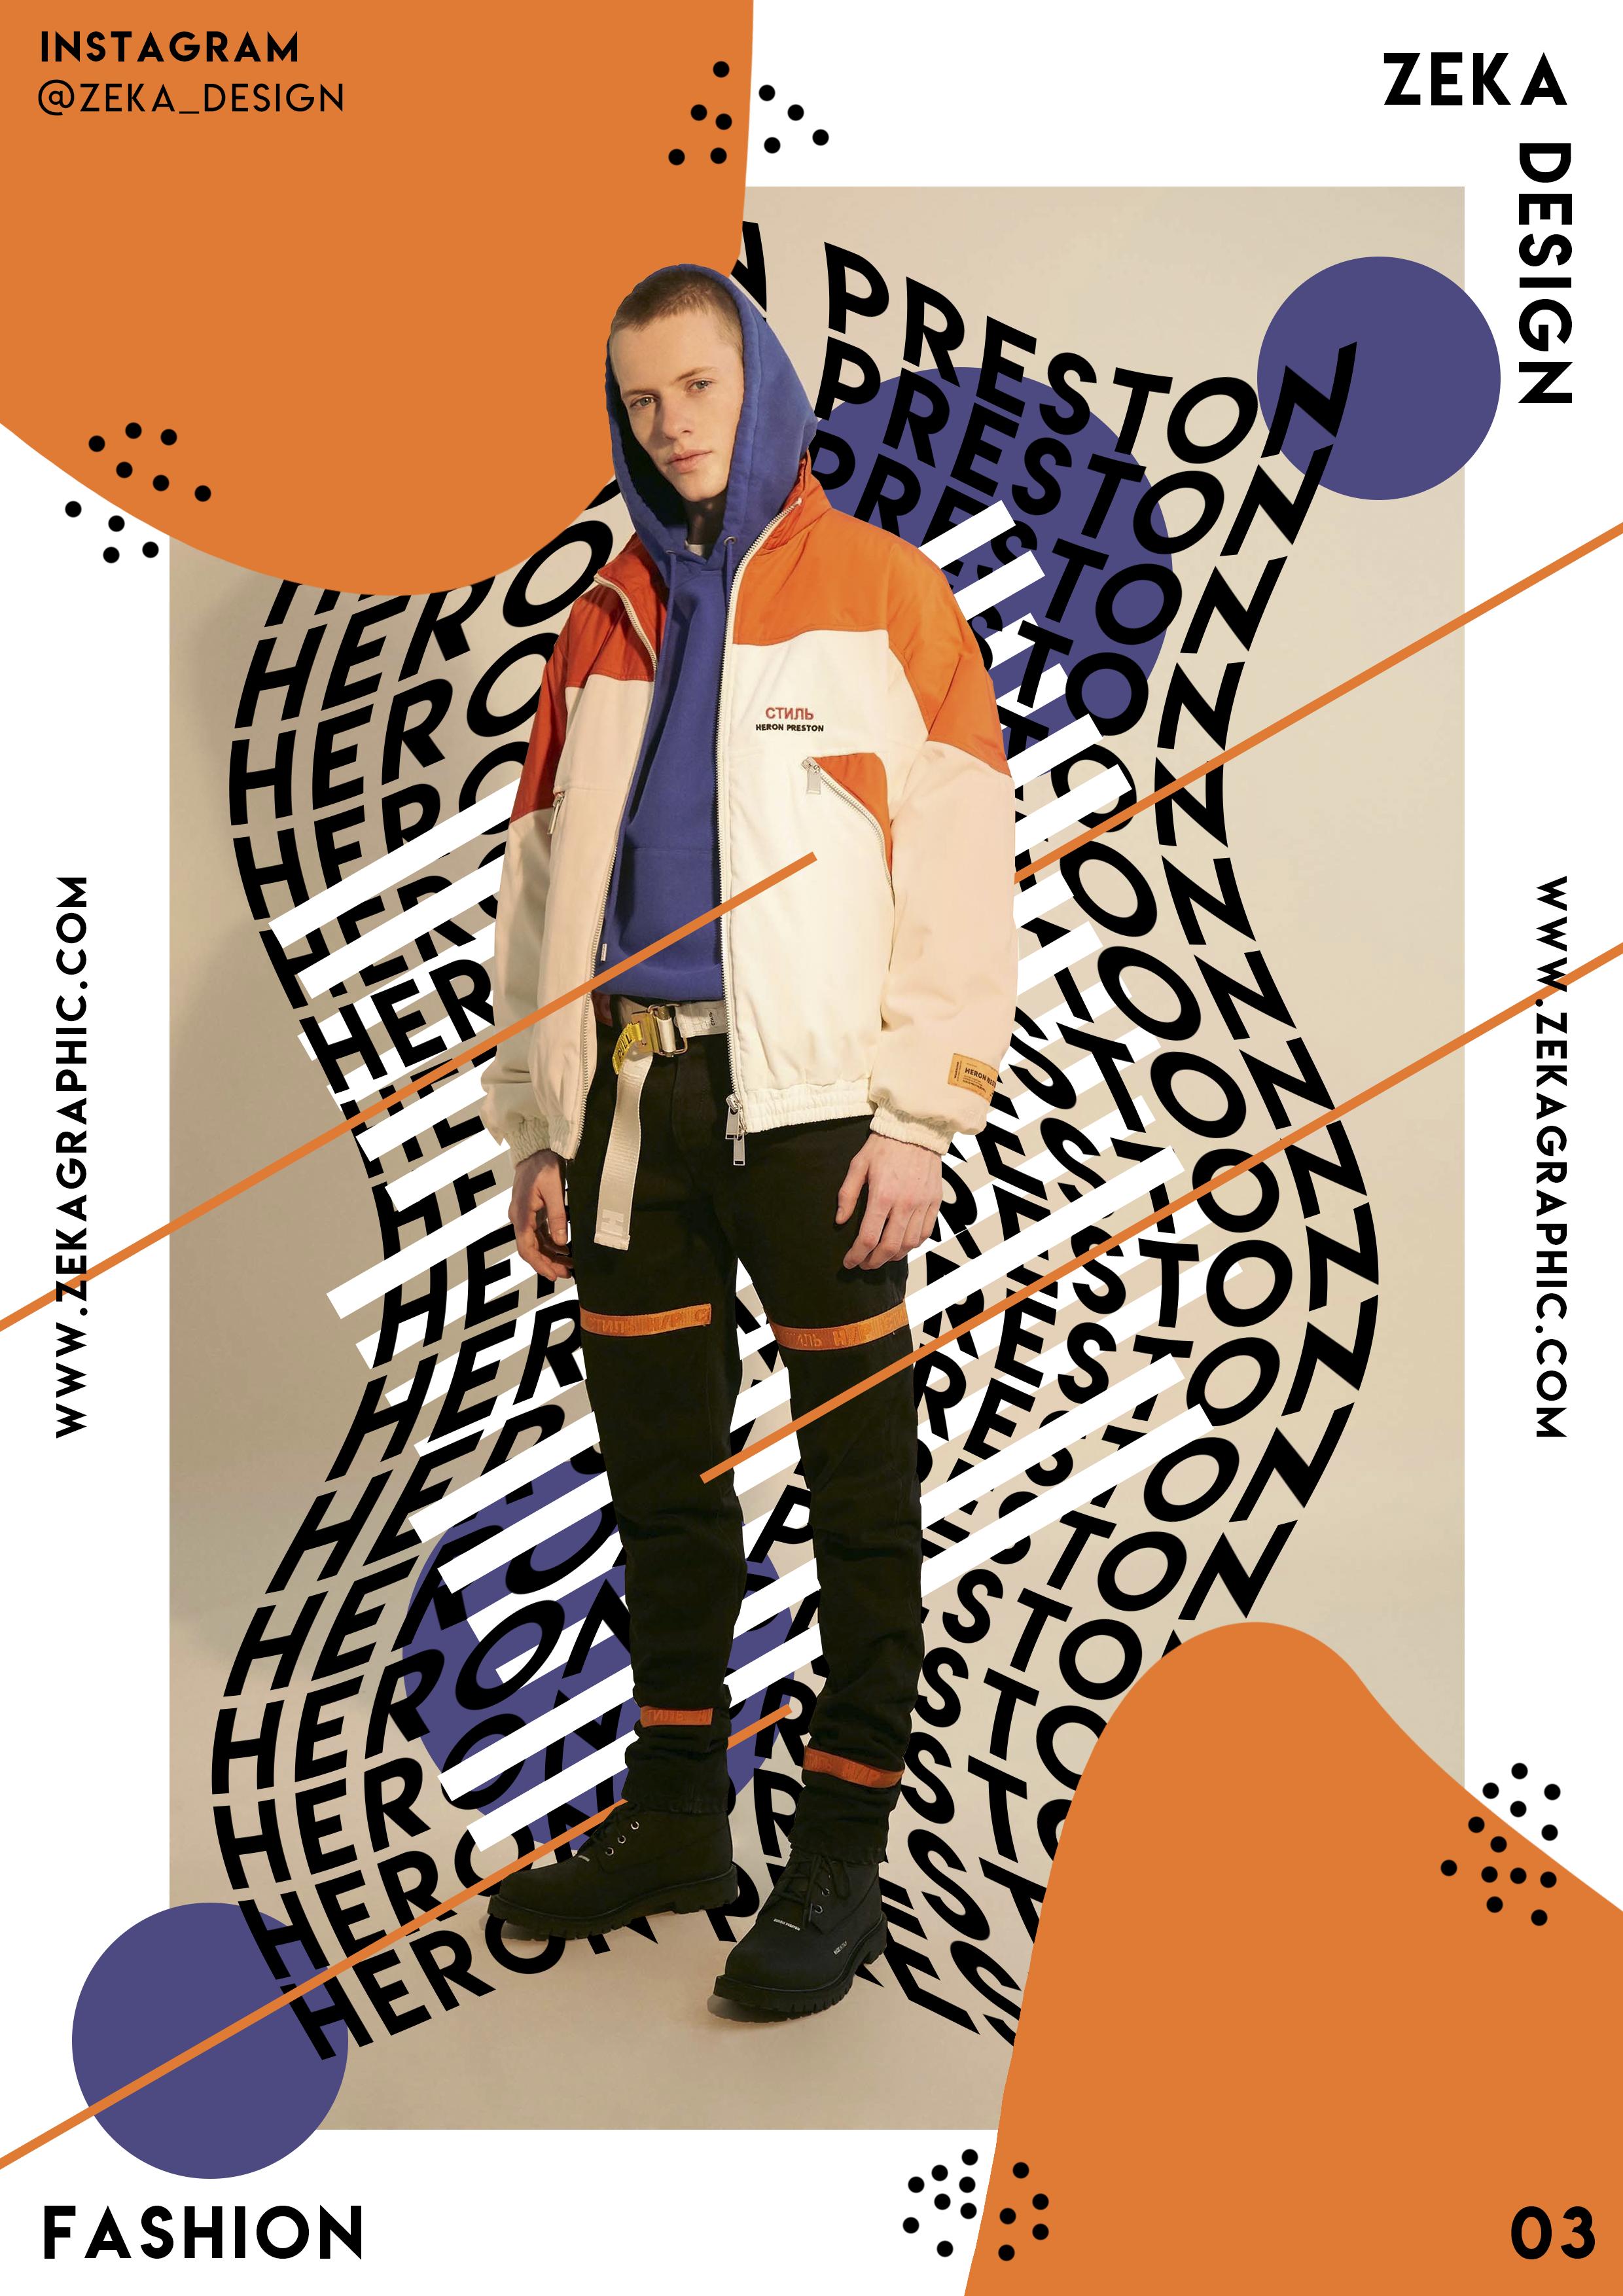 Creative Graphic Design Poster Heron Preston Fashion Collection 01 Zeka Design #graphicdesign